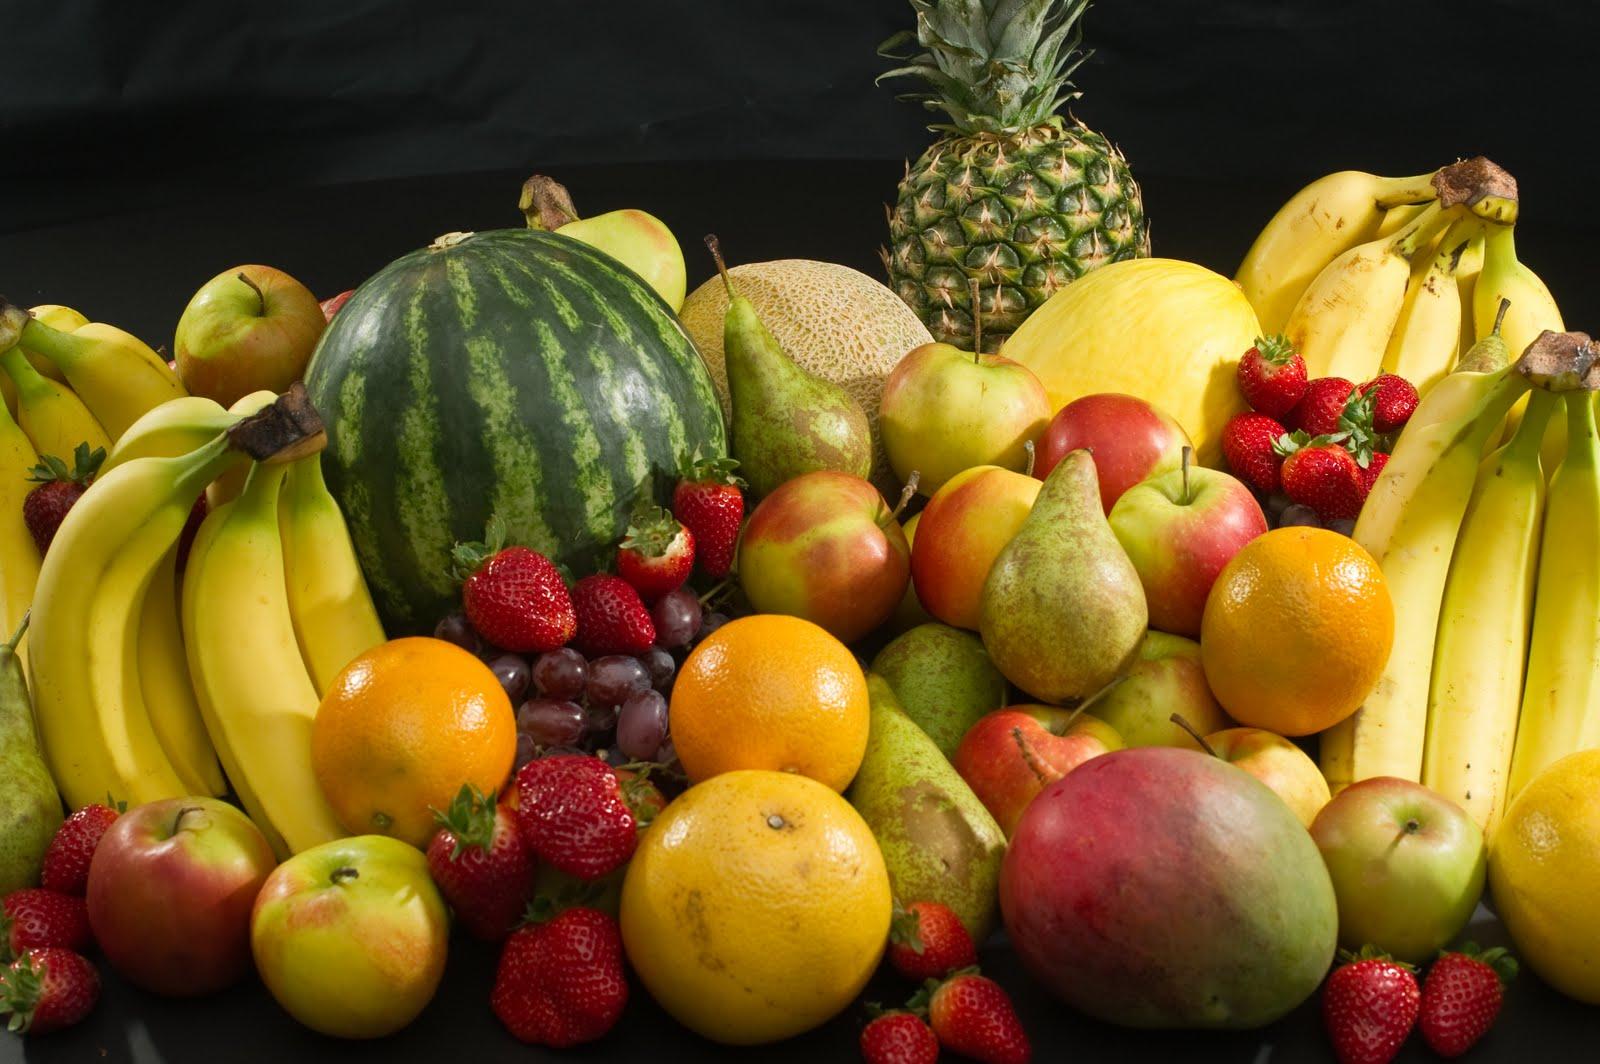 Fermented+Fruit+Juice-782168 - Philippine Fruits - Philippine Photo Gallery